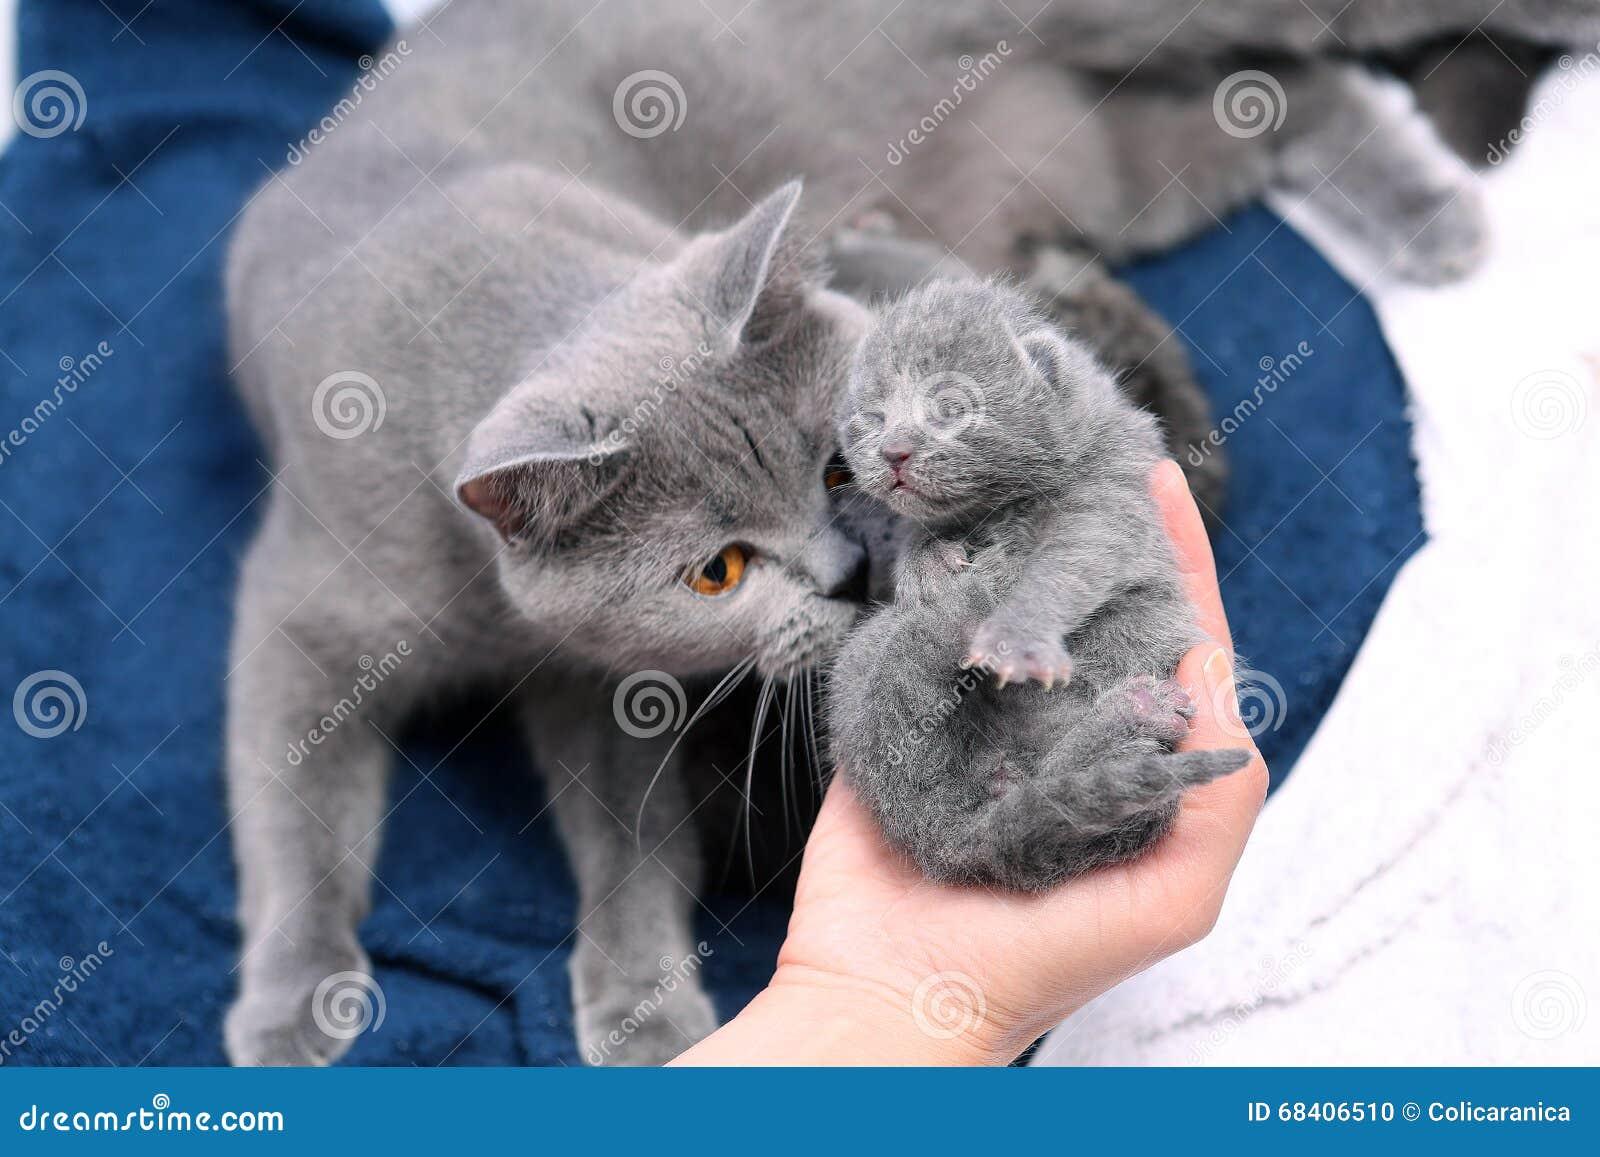 Cat lifespan female - Cryptokitties clone